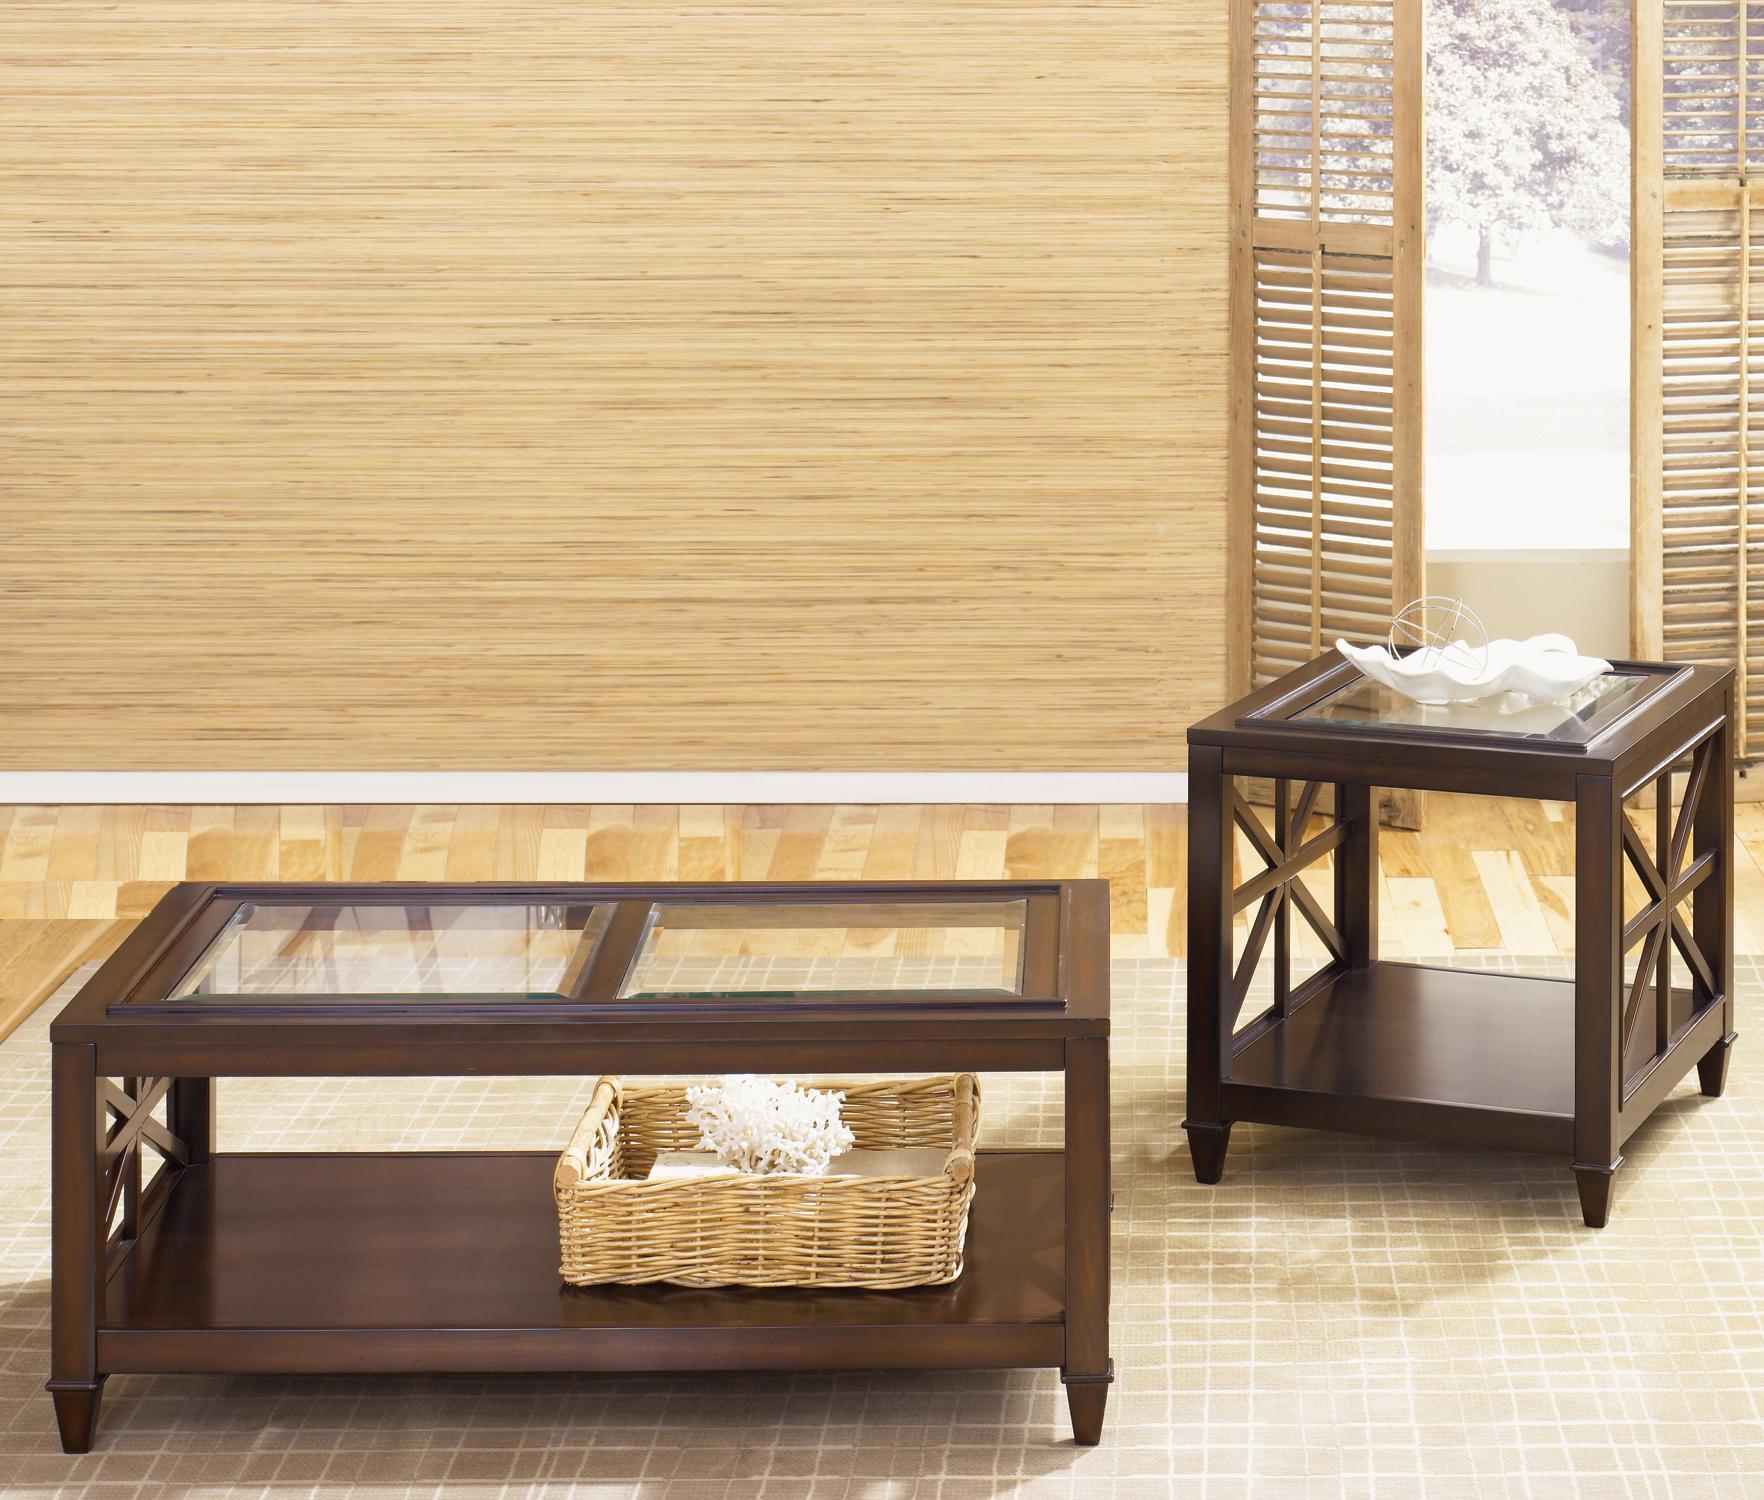 Liberty Furniture Caroline 3-Piece Occasional Table Set - Item Number: 318-OT-SET05